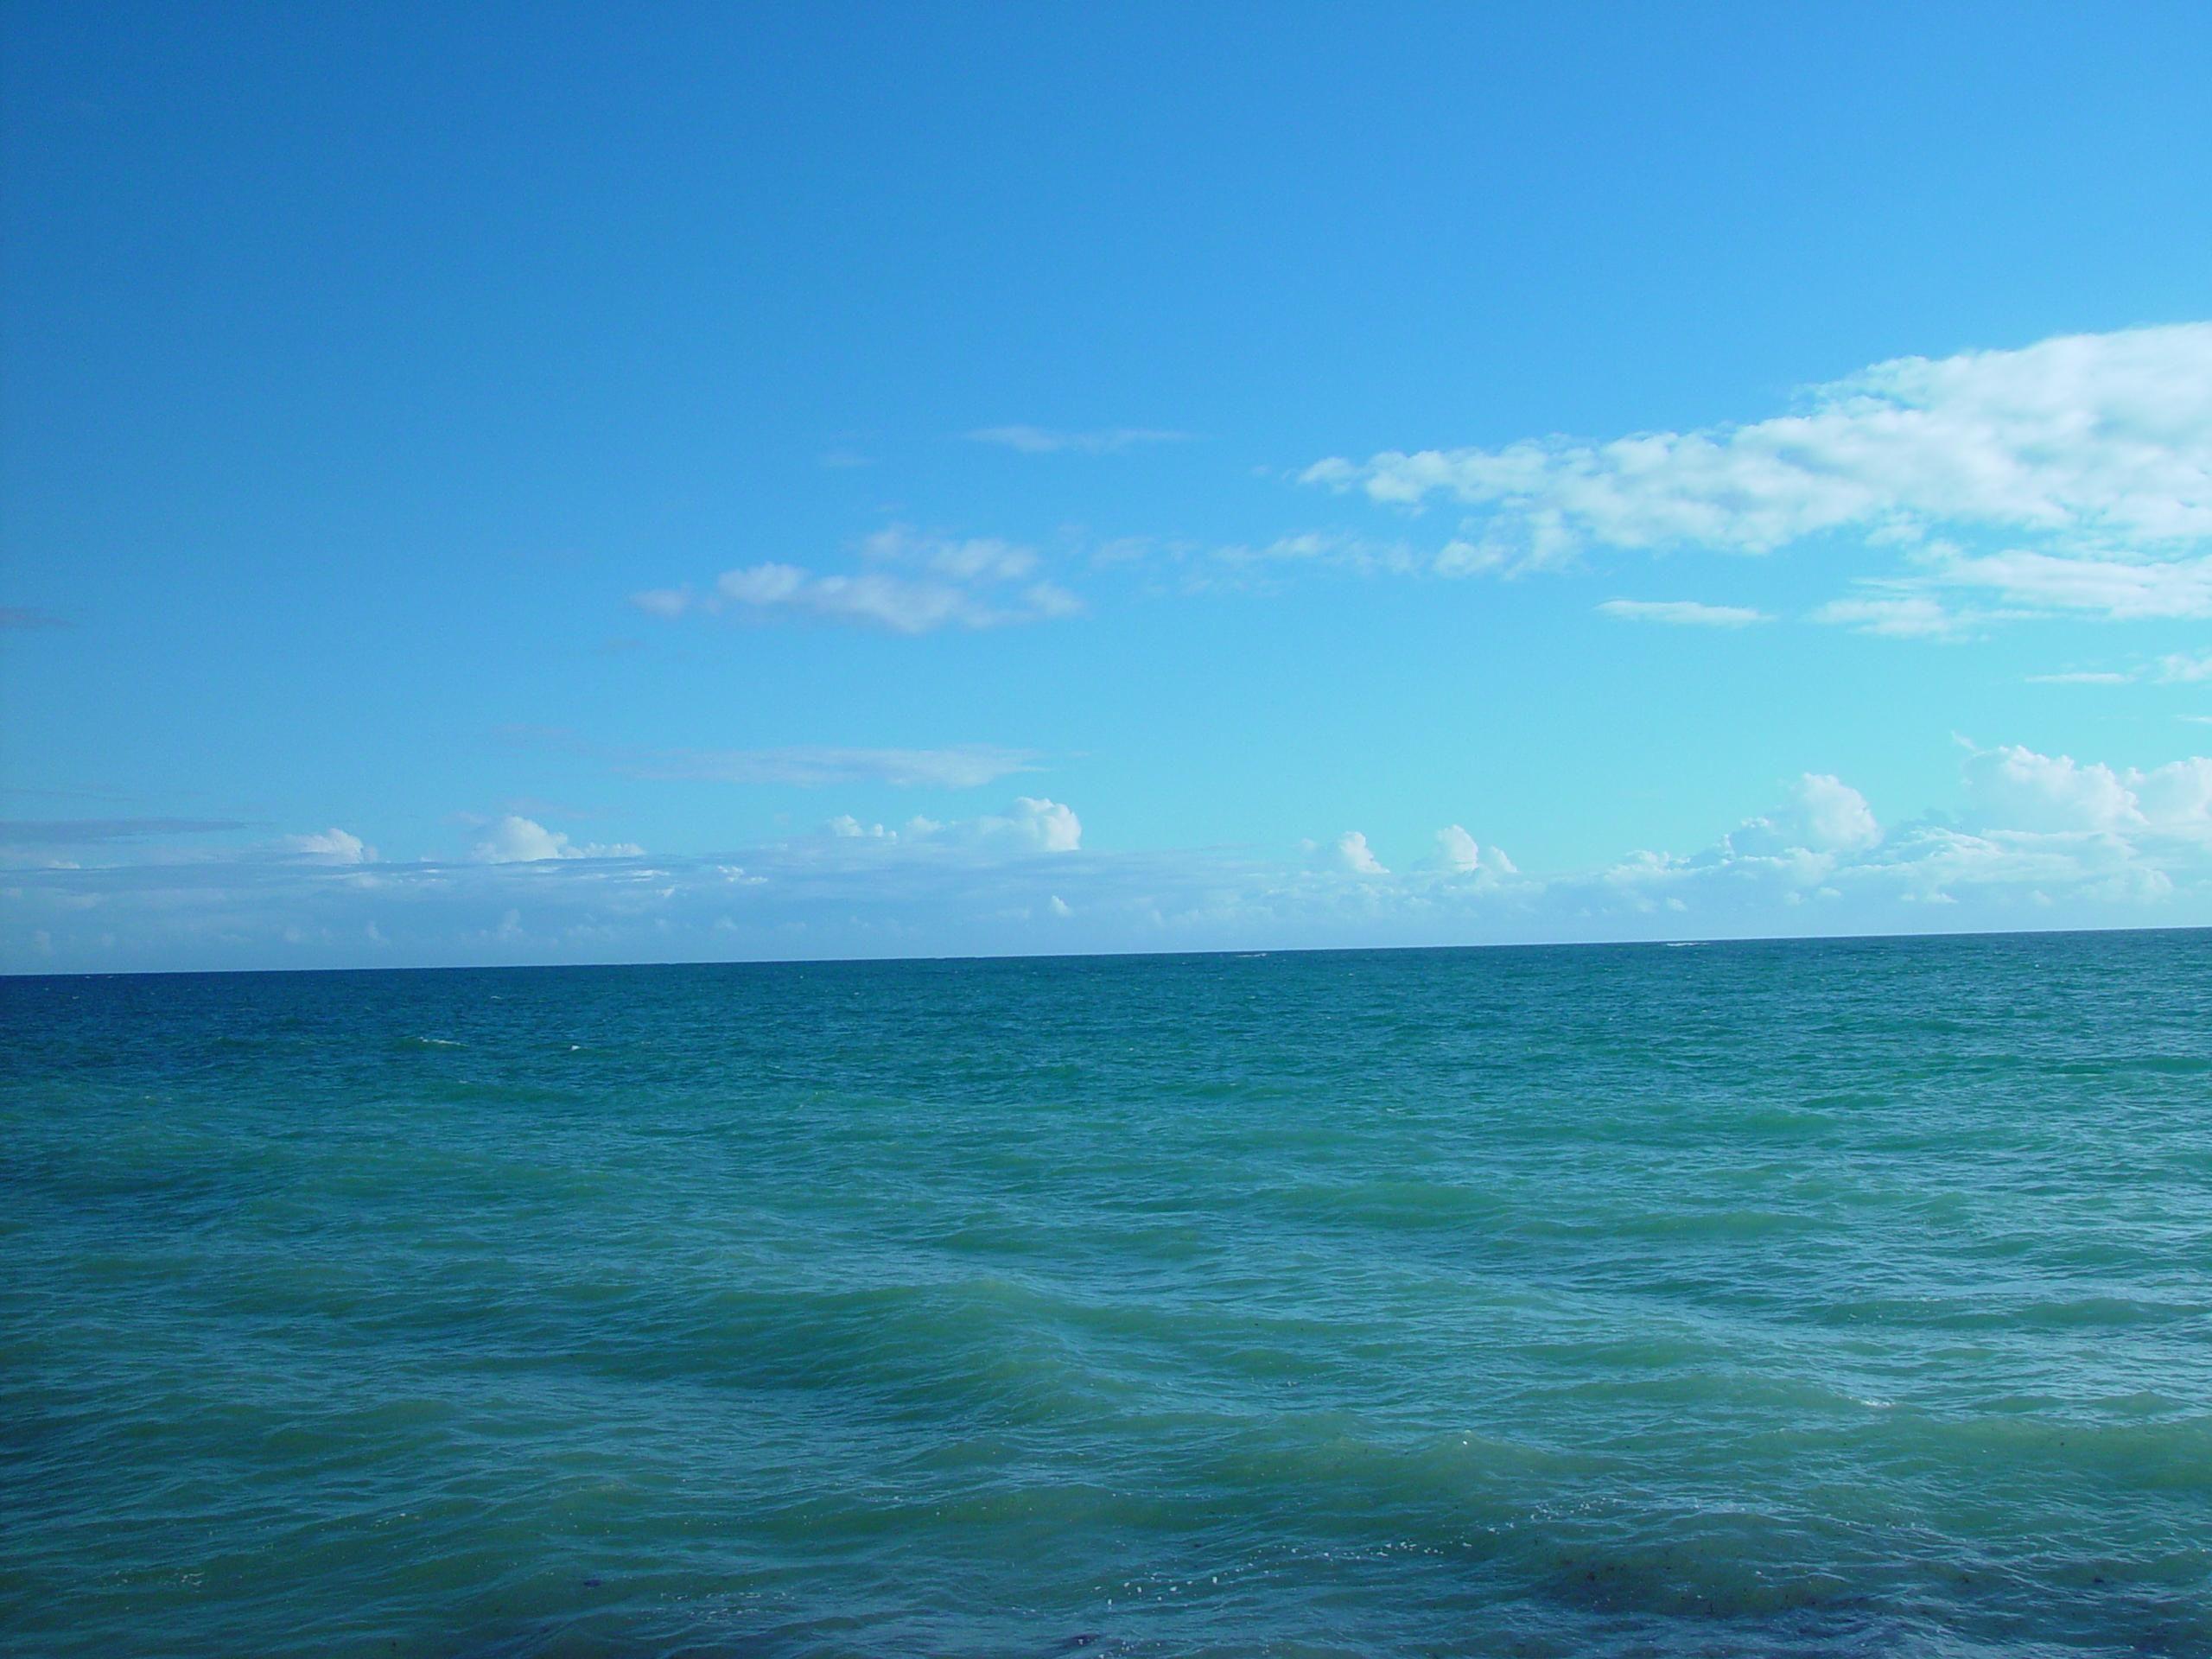 Ocean Blue Graphics Riviera Beach Fl